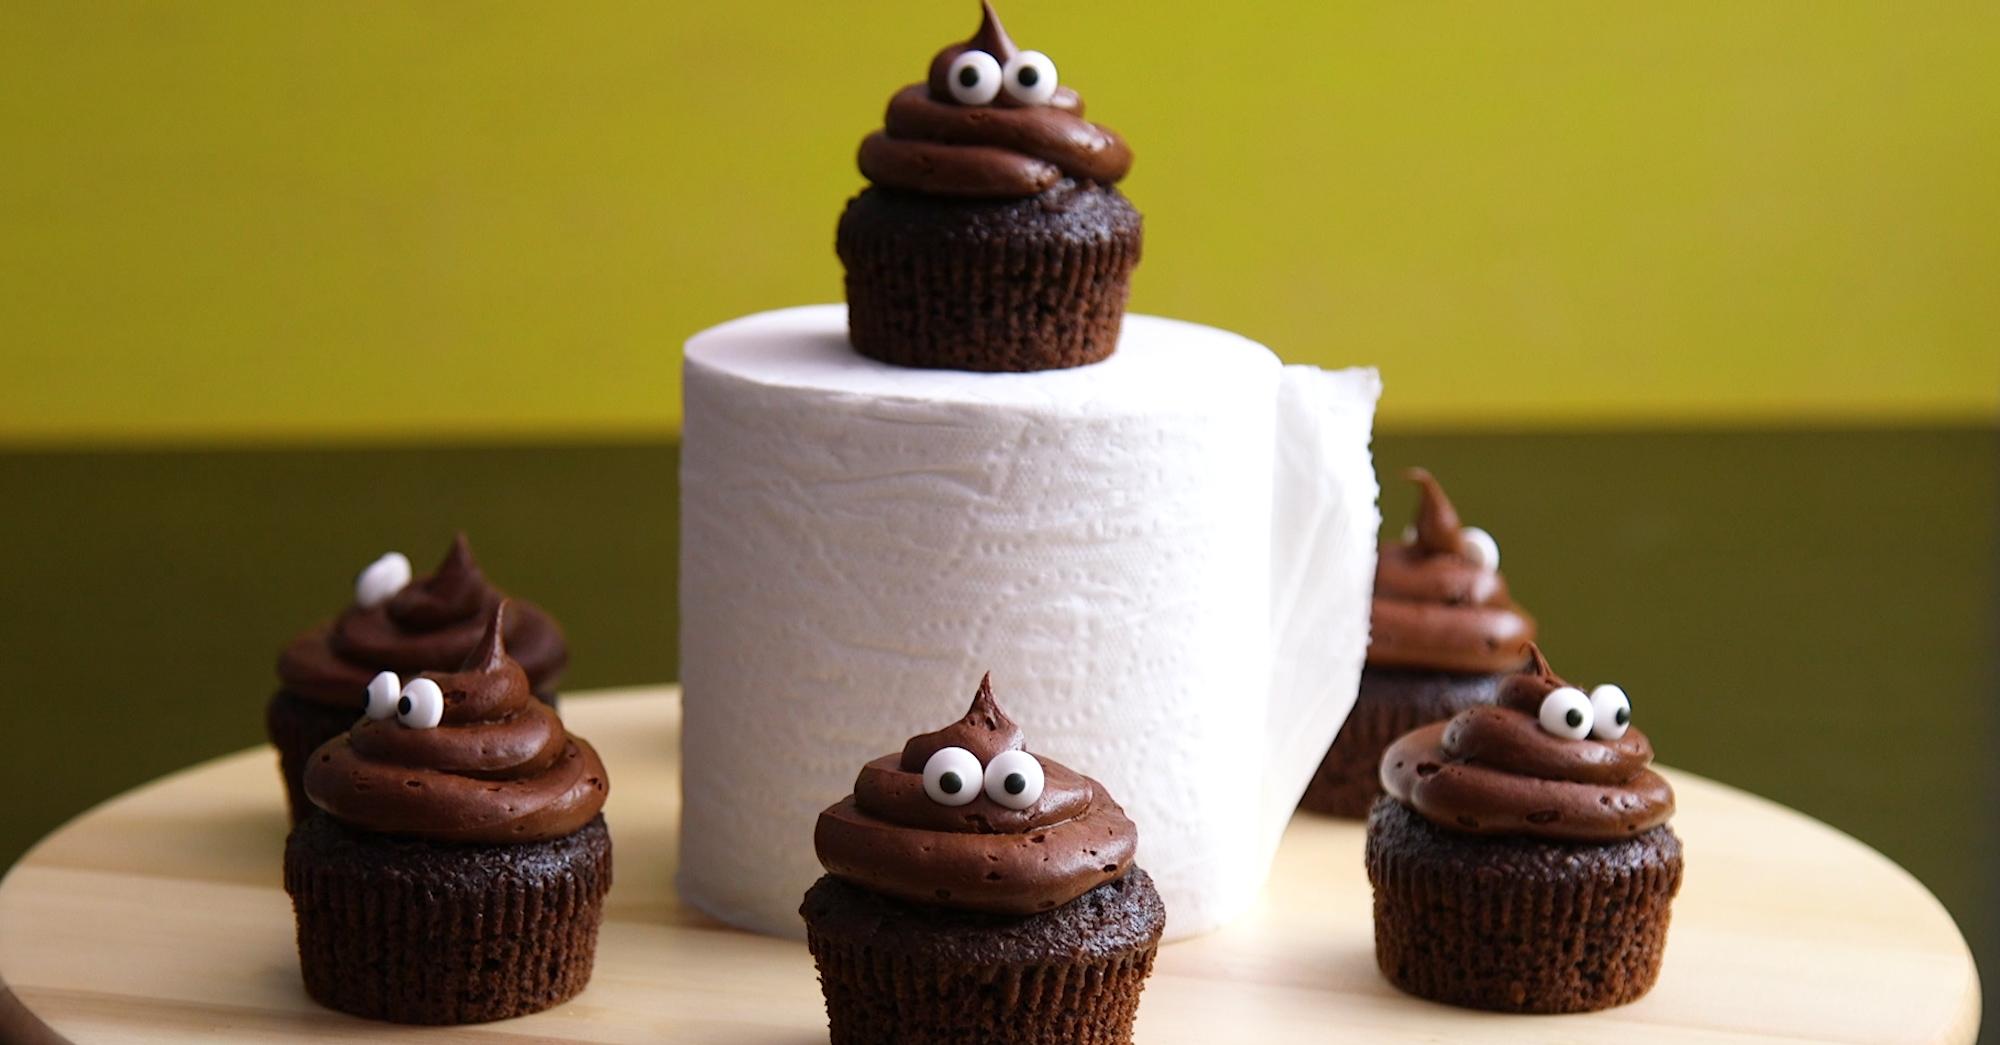 Poop Emoji Cupcake Recipe Shared Com